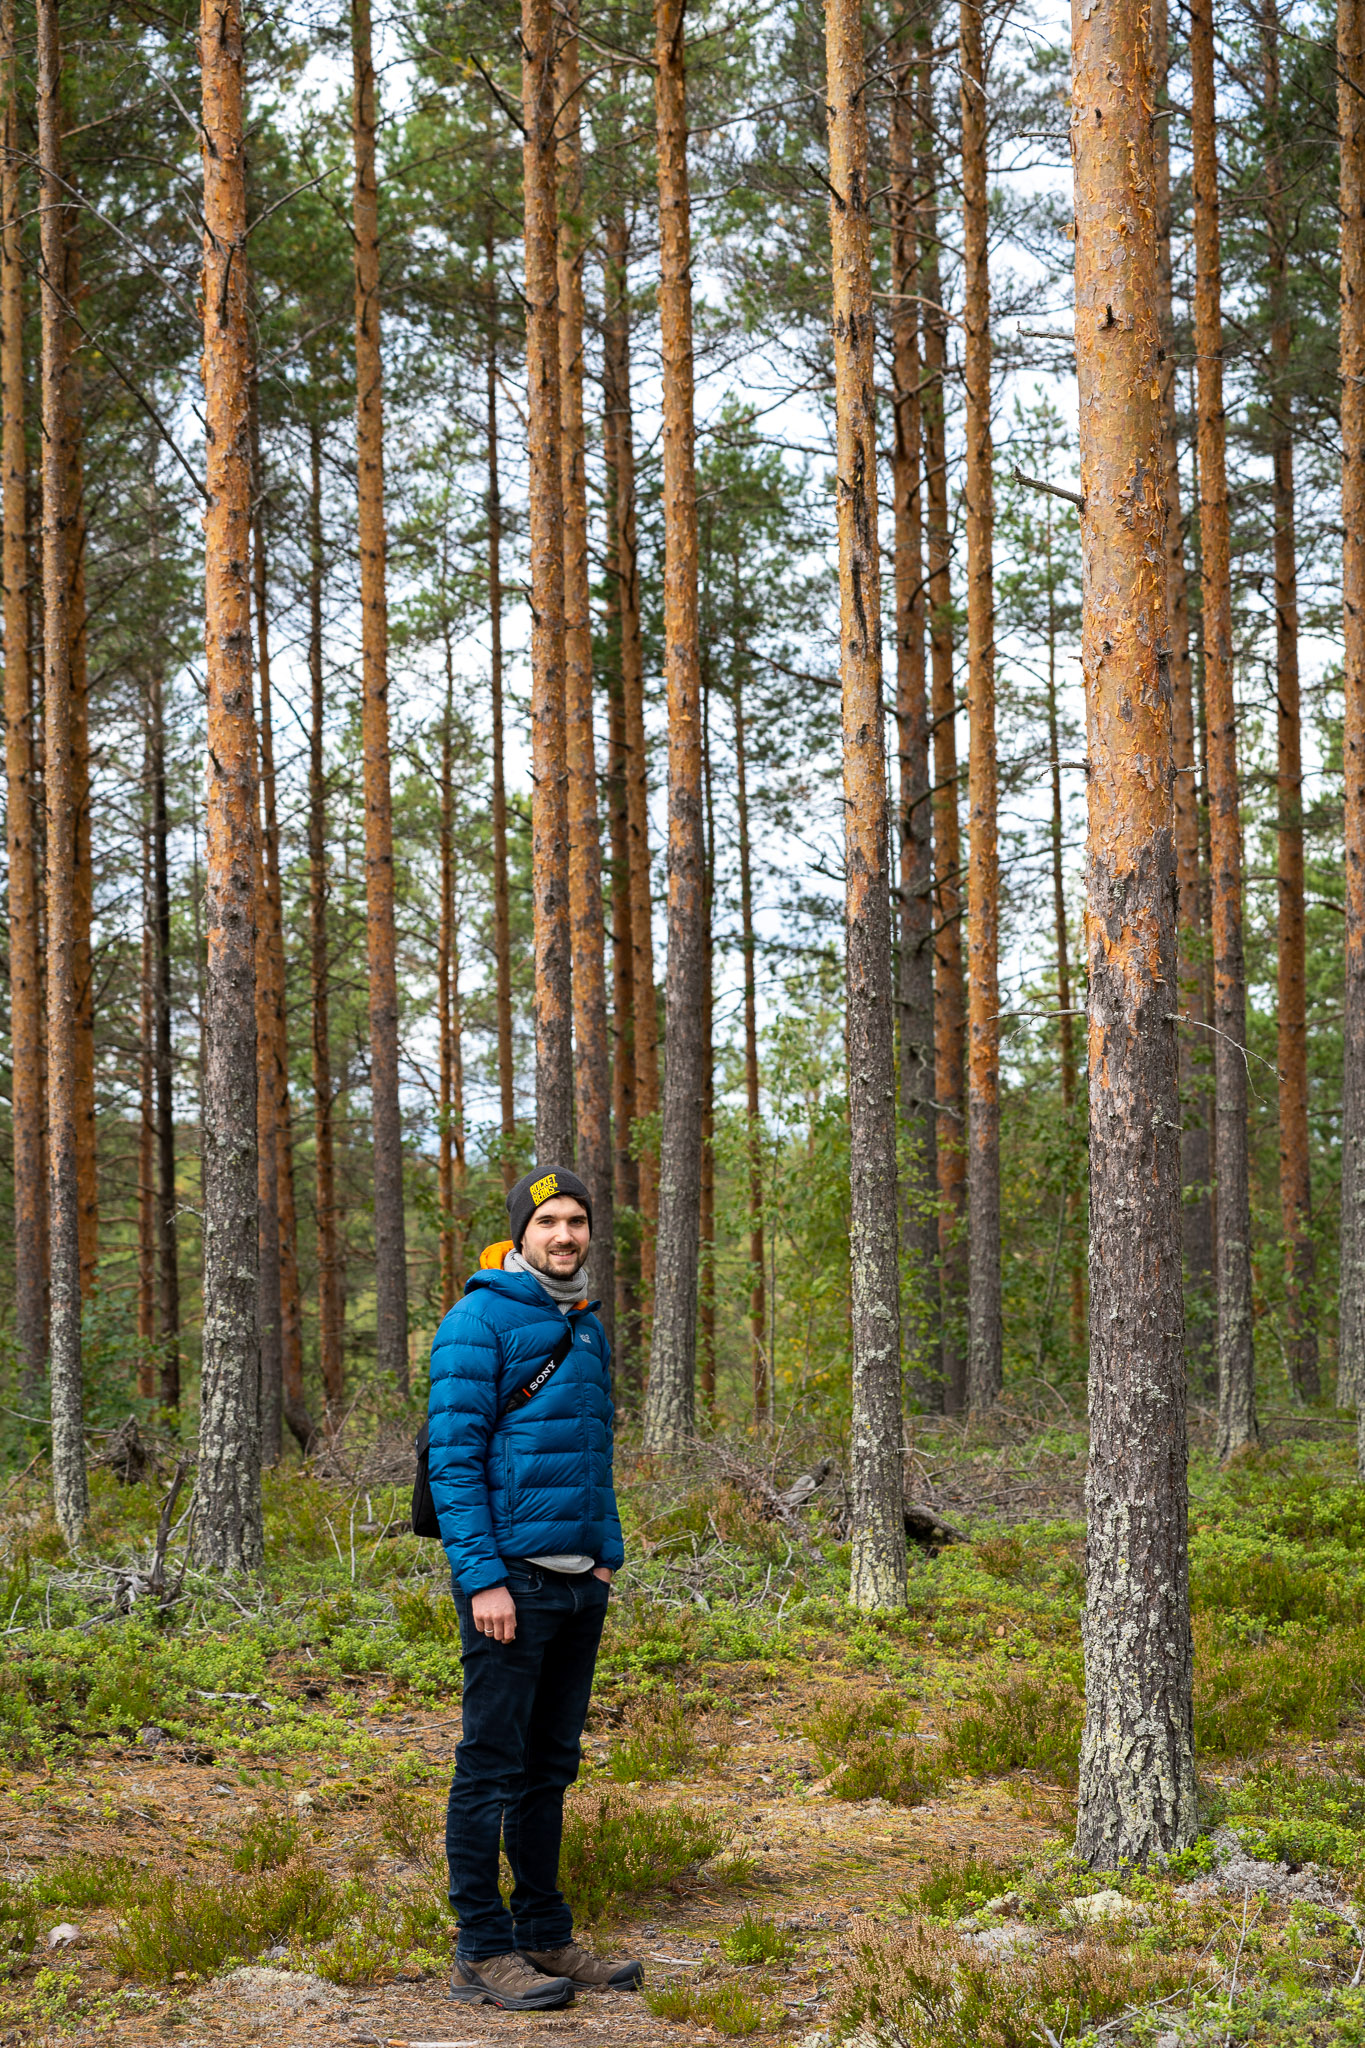 Lukas im Wald